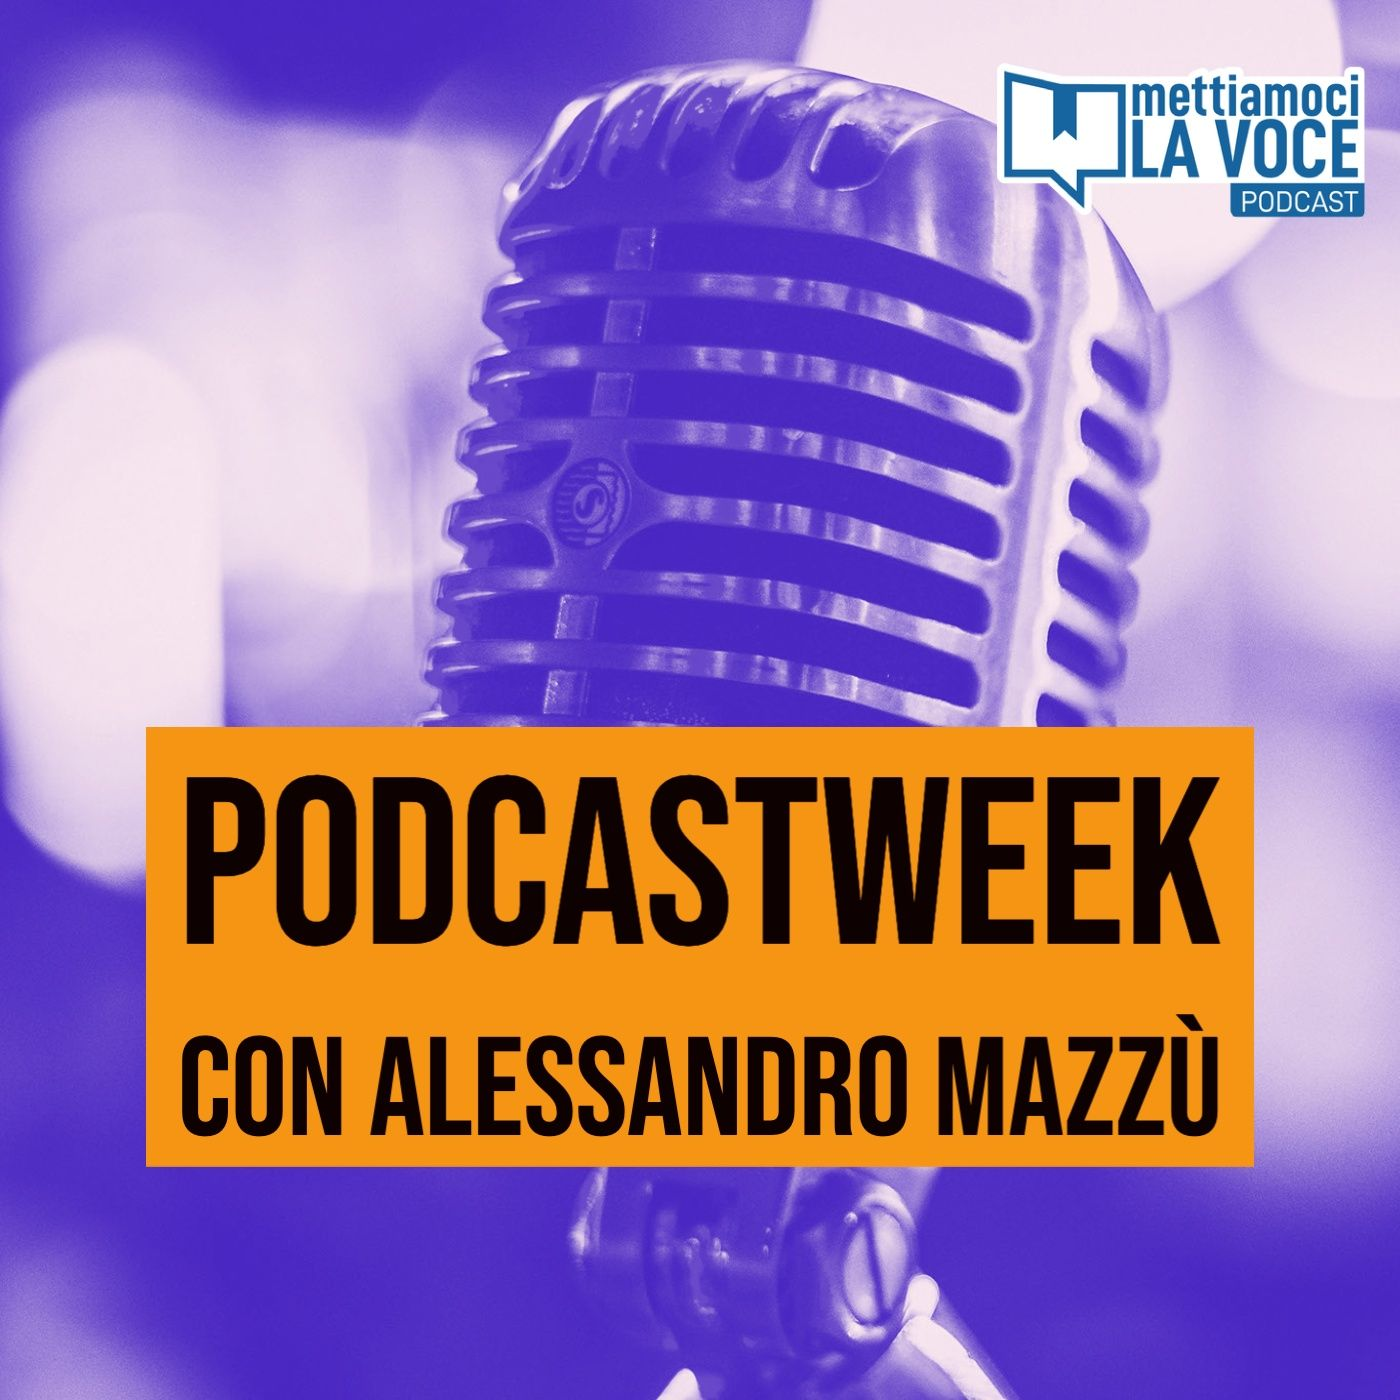 176 - Podcast Week con Alessandro Mazzù